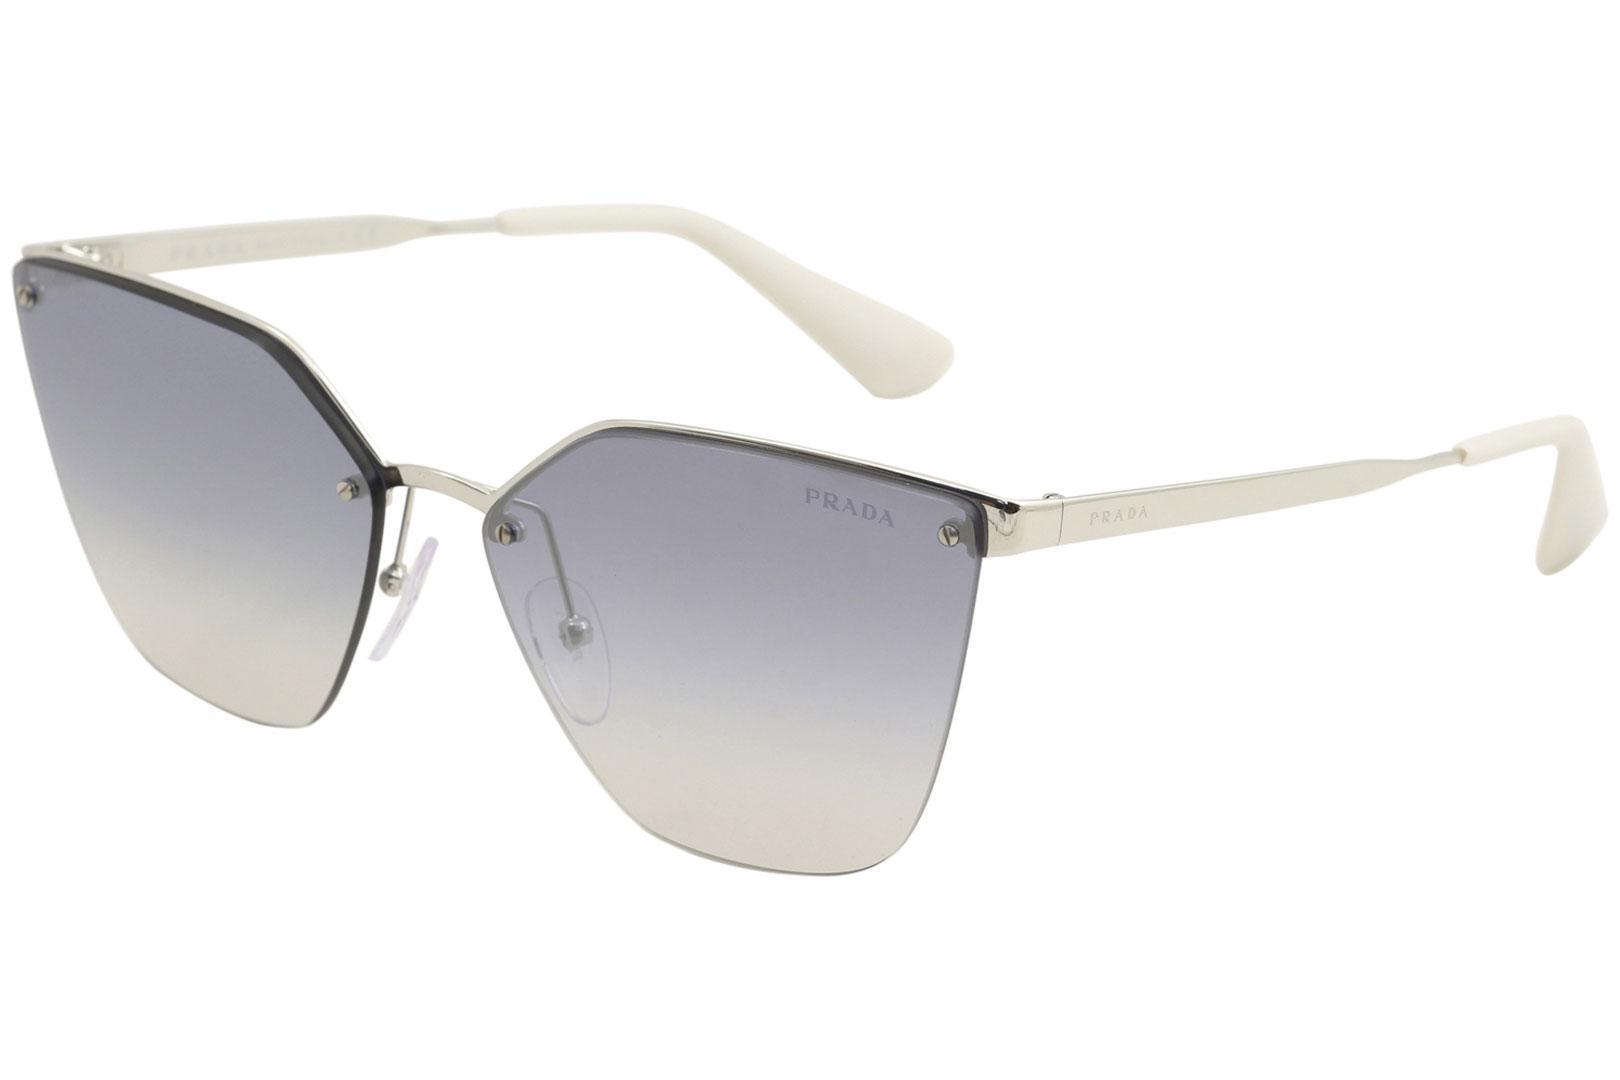 7c64a3877e Prada Women s SPR68T SPR 68T Fashion Cat Eye Sunglasses